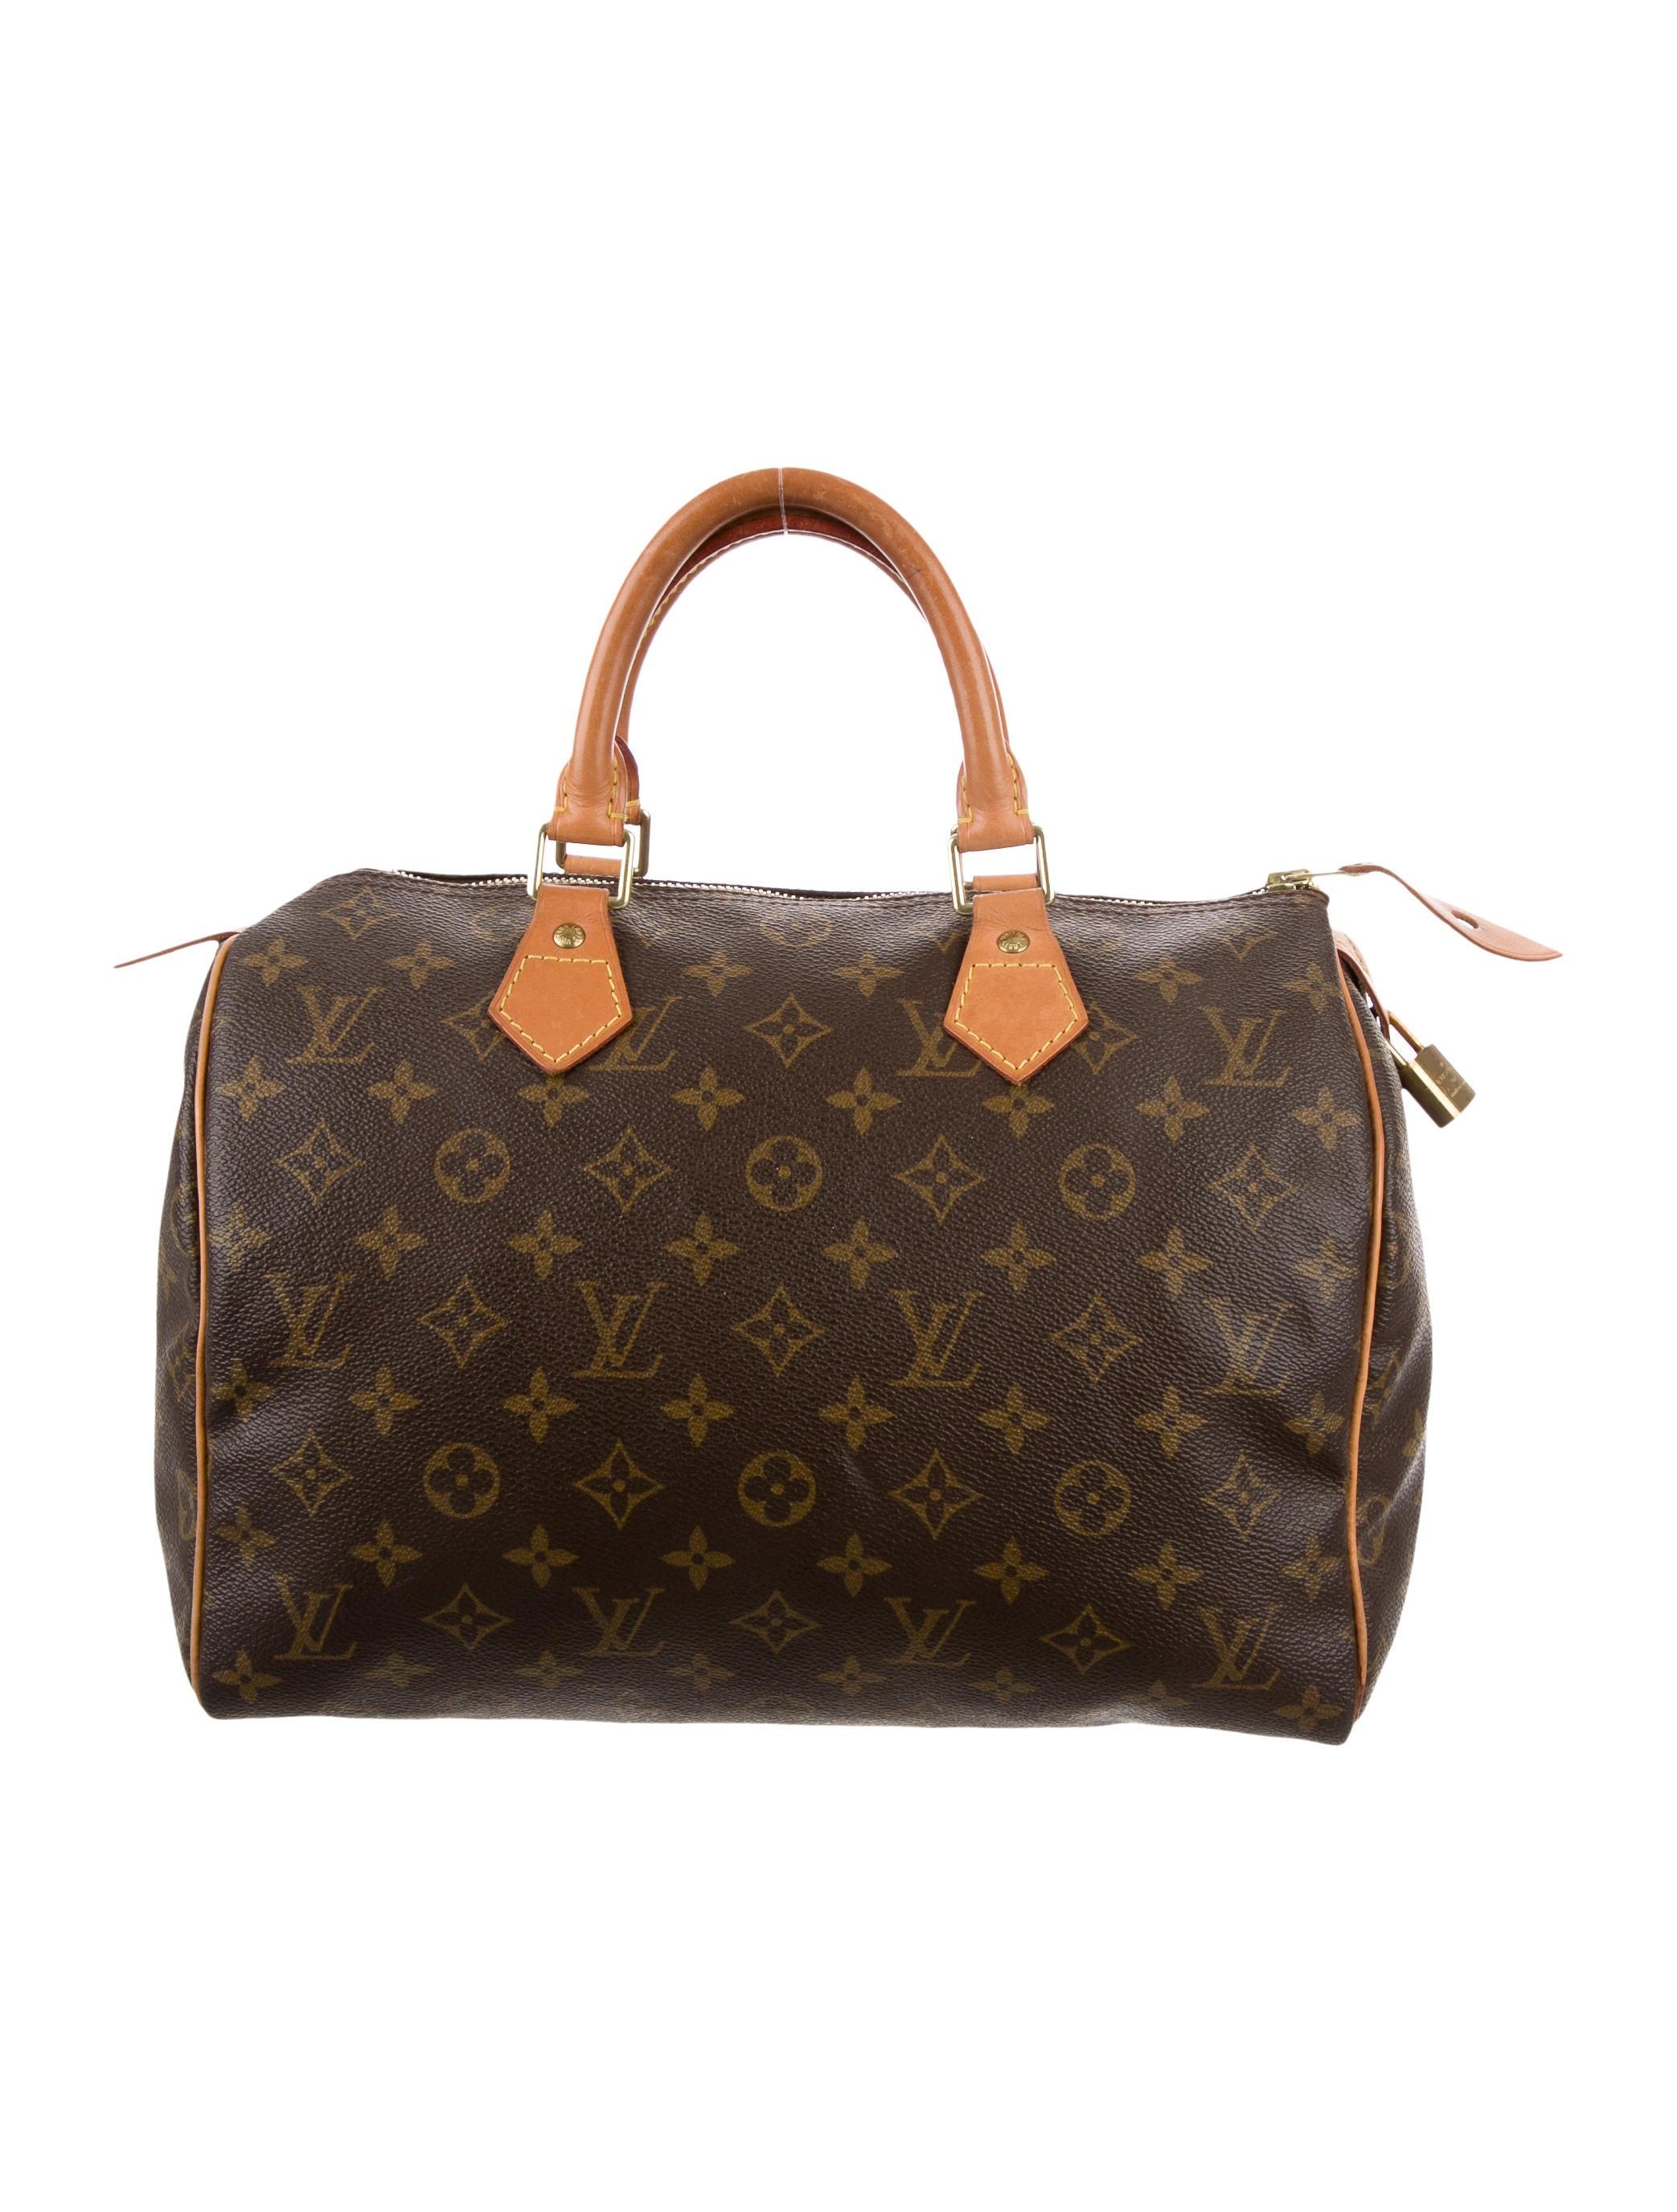 Louis vuitton monogram speedy 30 handbags lou88138 for Louis vuitton miroir speedy 30